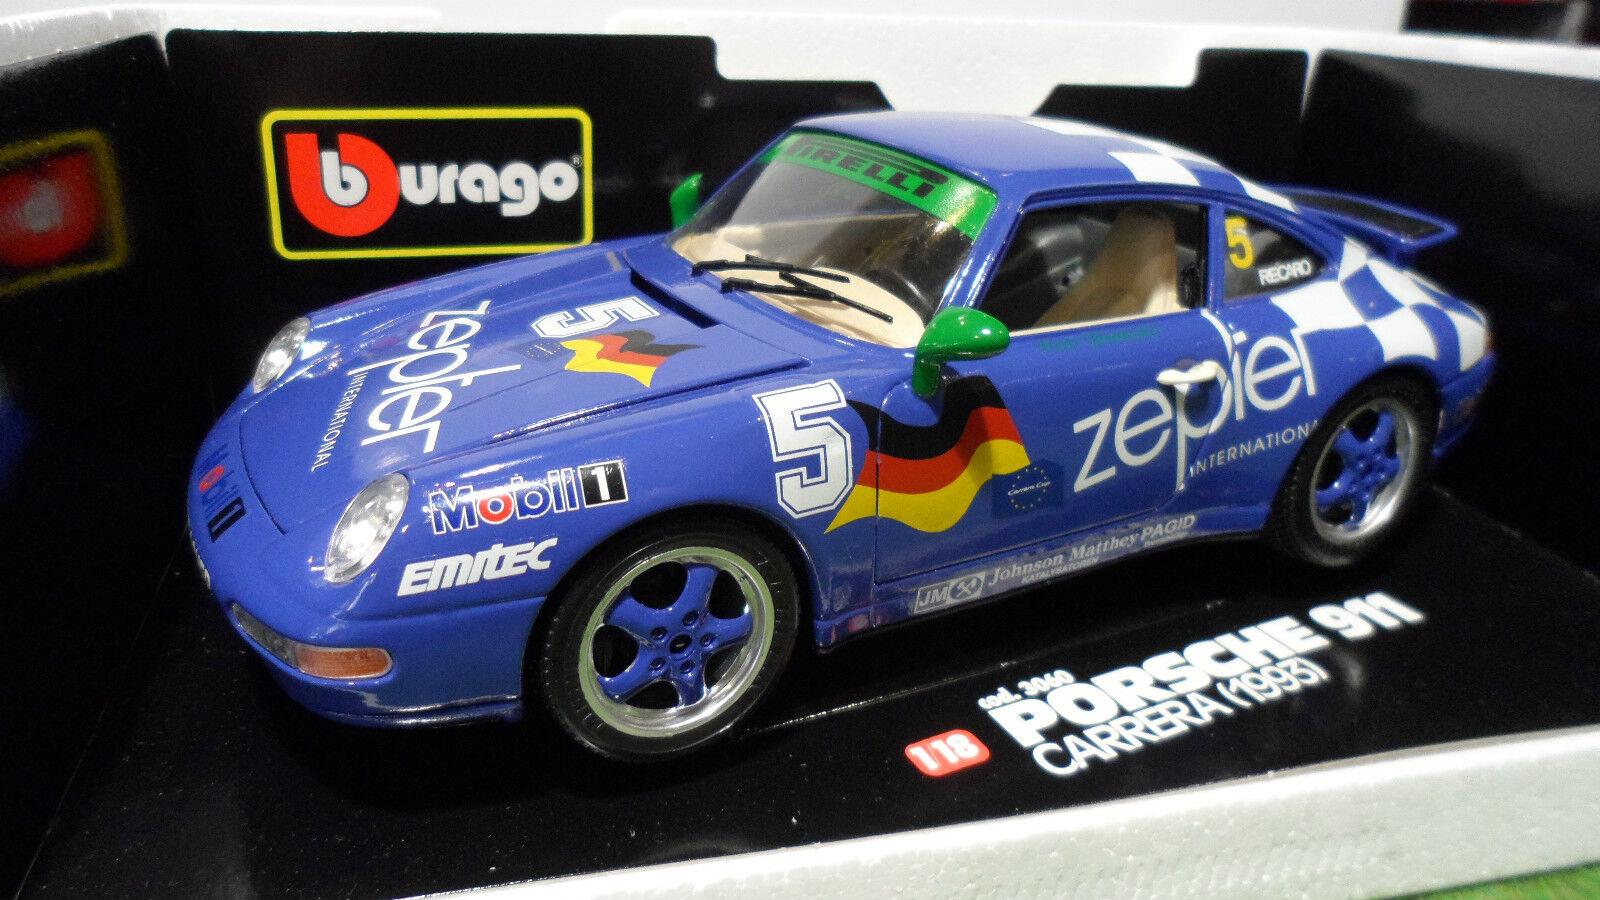 PORSCHE 911 CARRERA  5 Bleu 1 18 BURAGO voiture miniature Made  giovanni